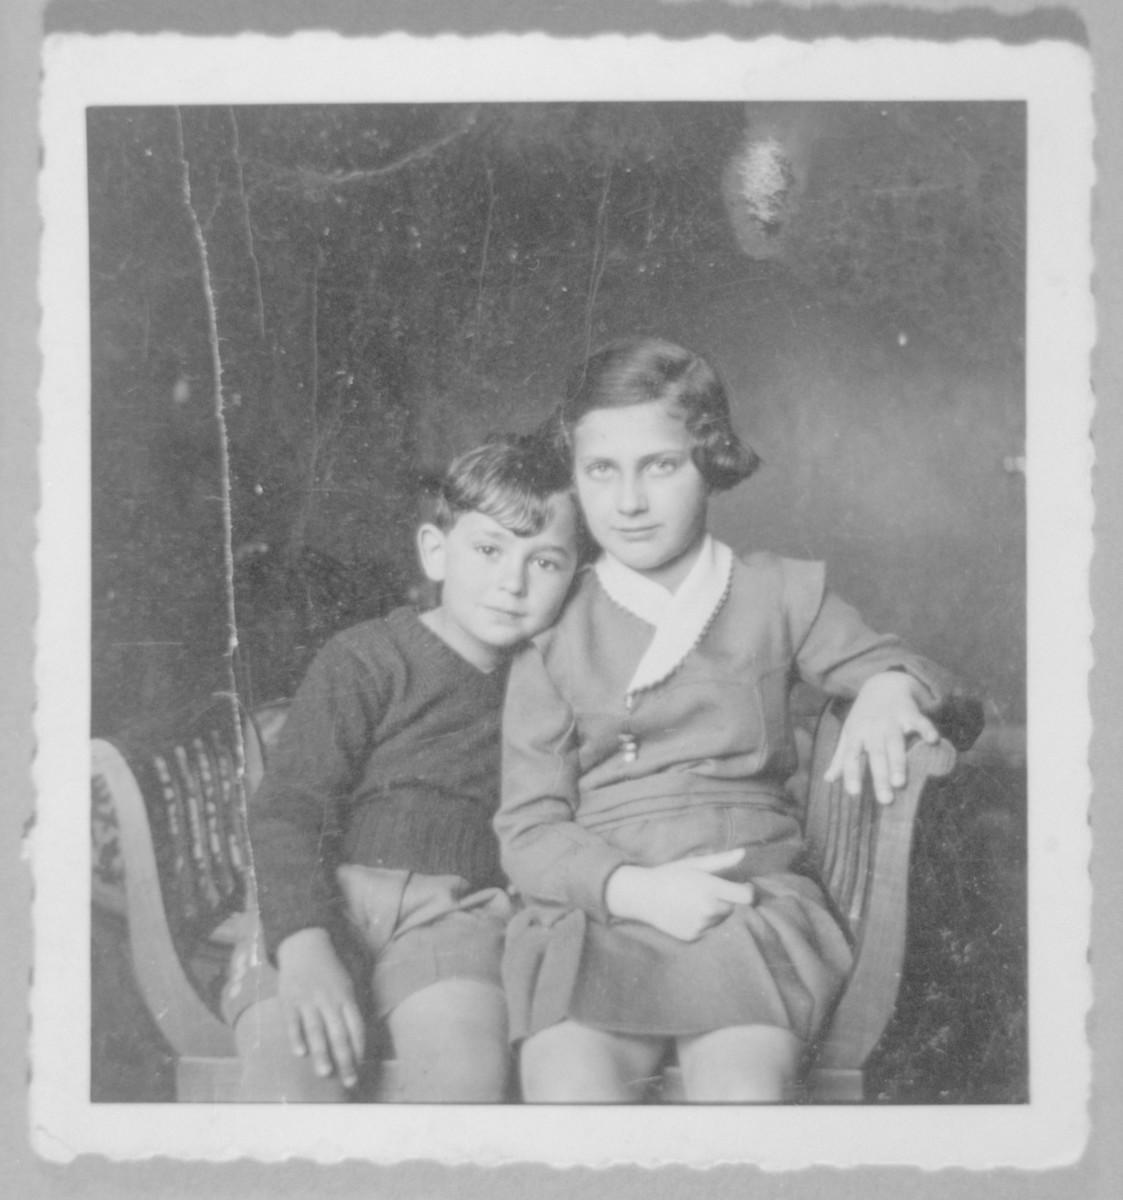 Roman Frister poses with his cousin Jadwiga Rosenstock (later Wiener).